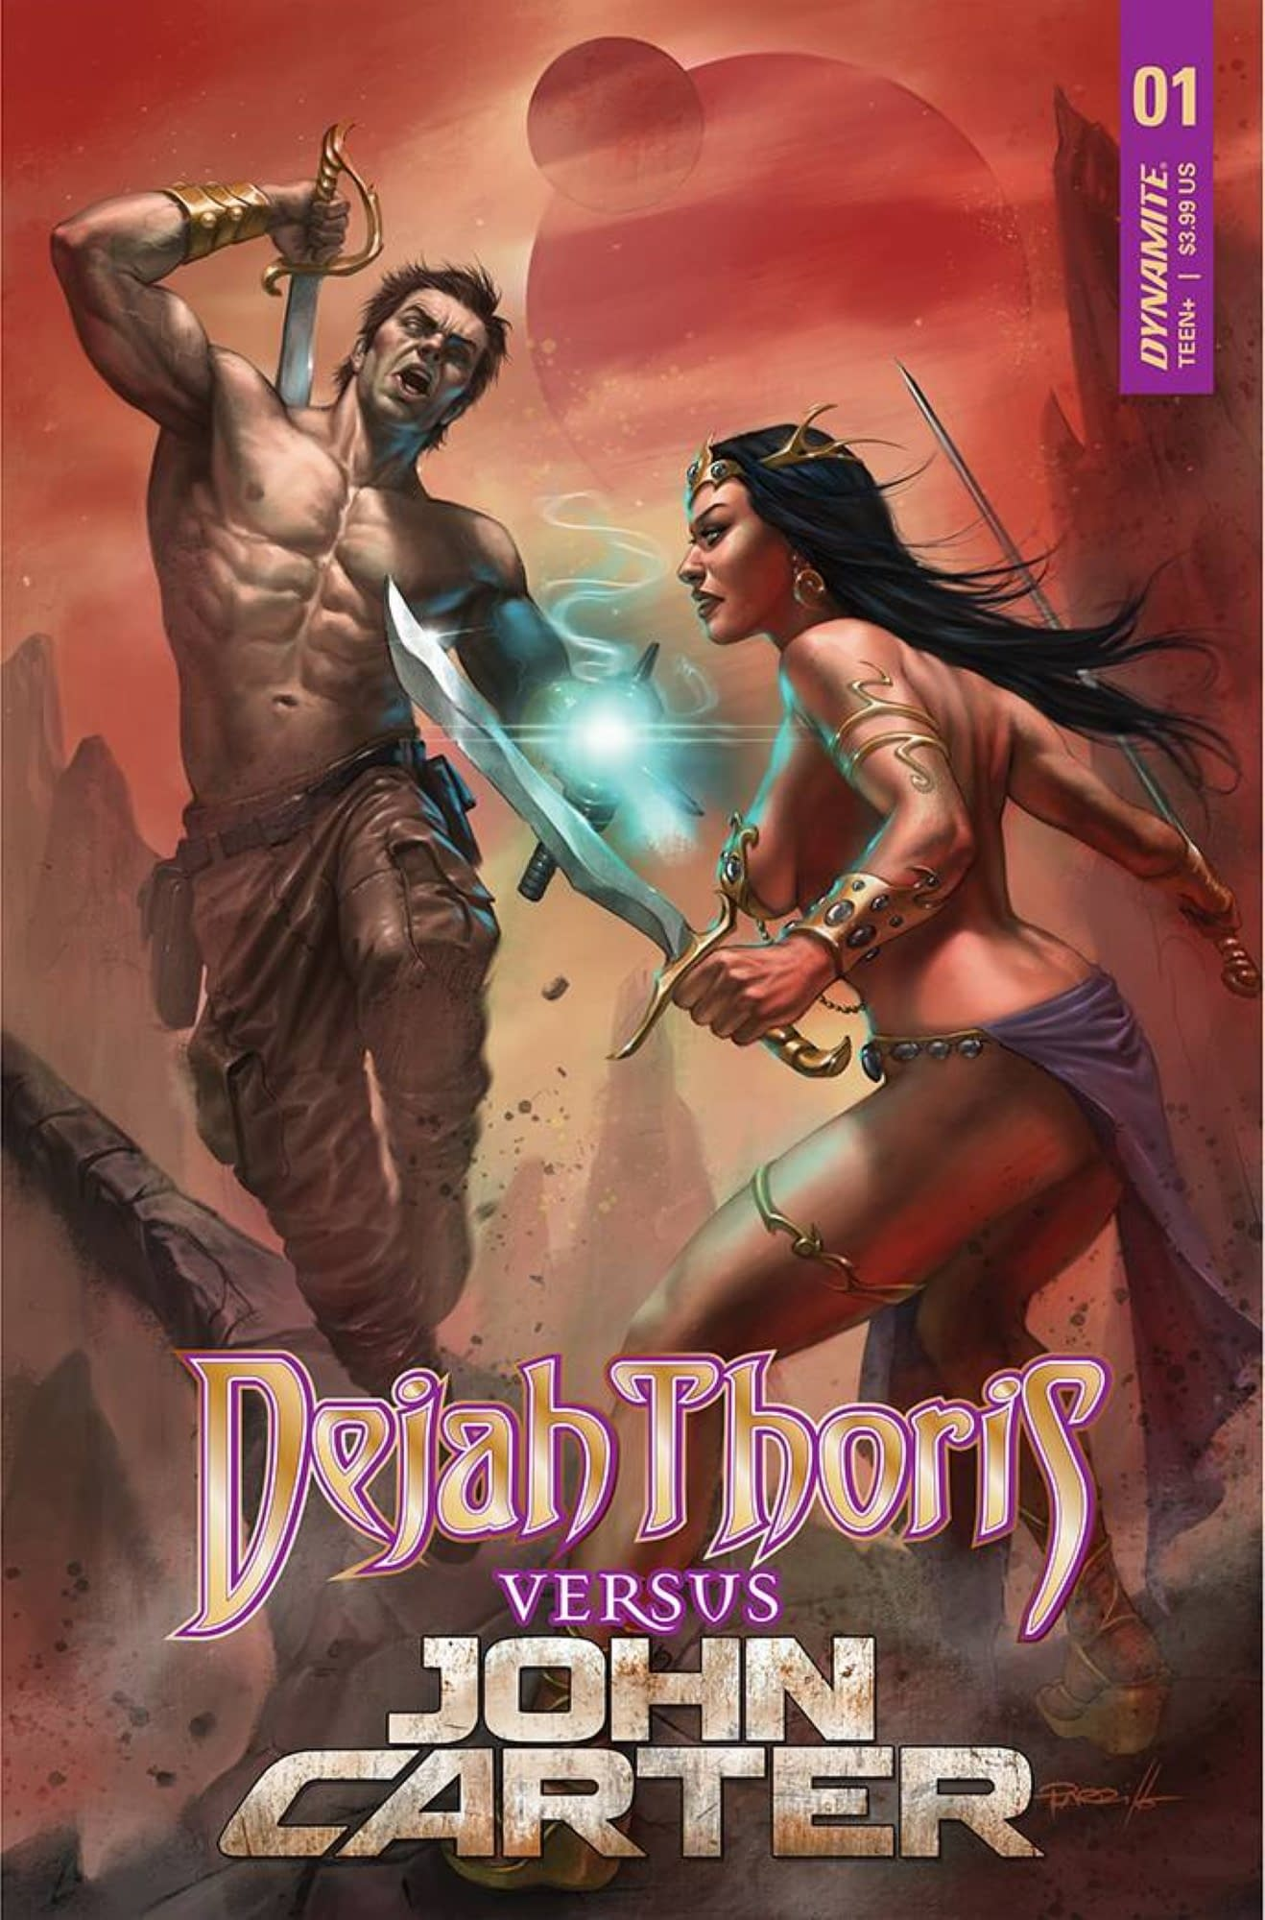 DEJAH THORIS VS JOHN CARTER OF MARS #1 CVR A PARRILLO